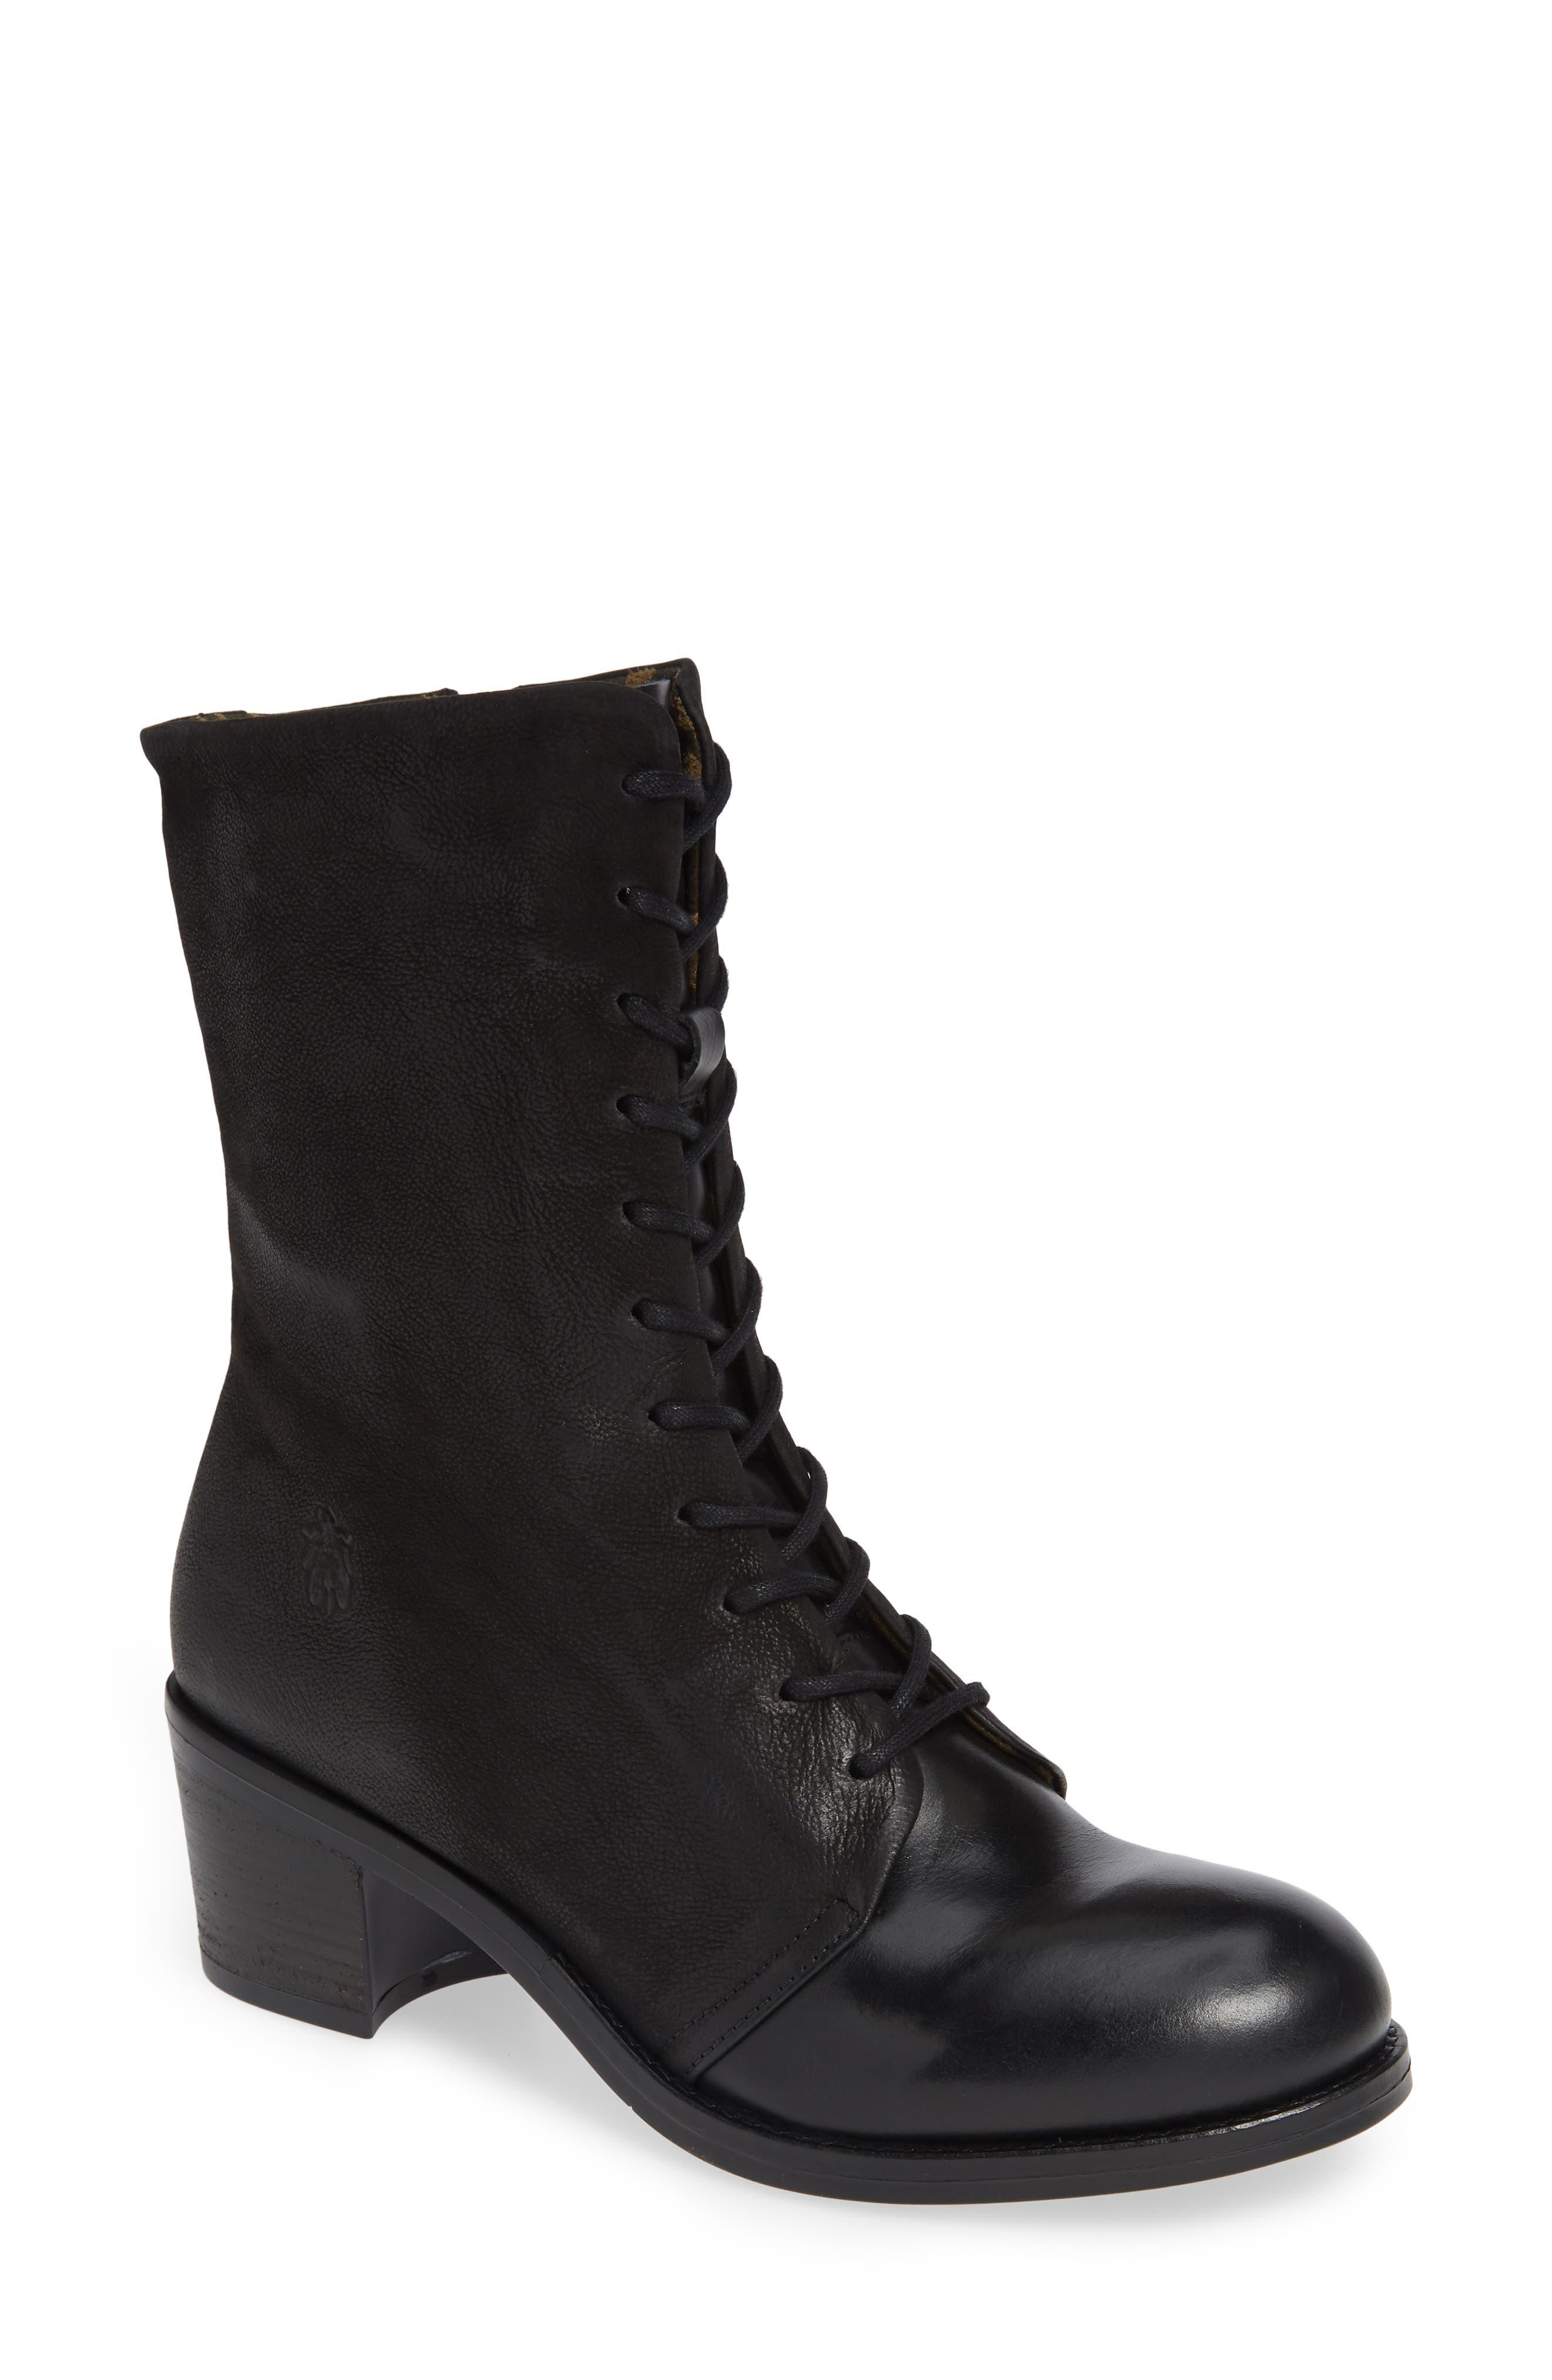 Fly London Zeko Lace-Up Boot, Black